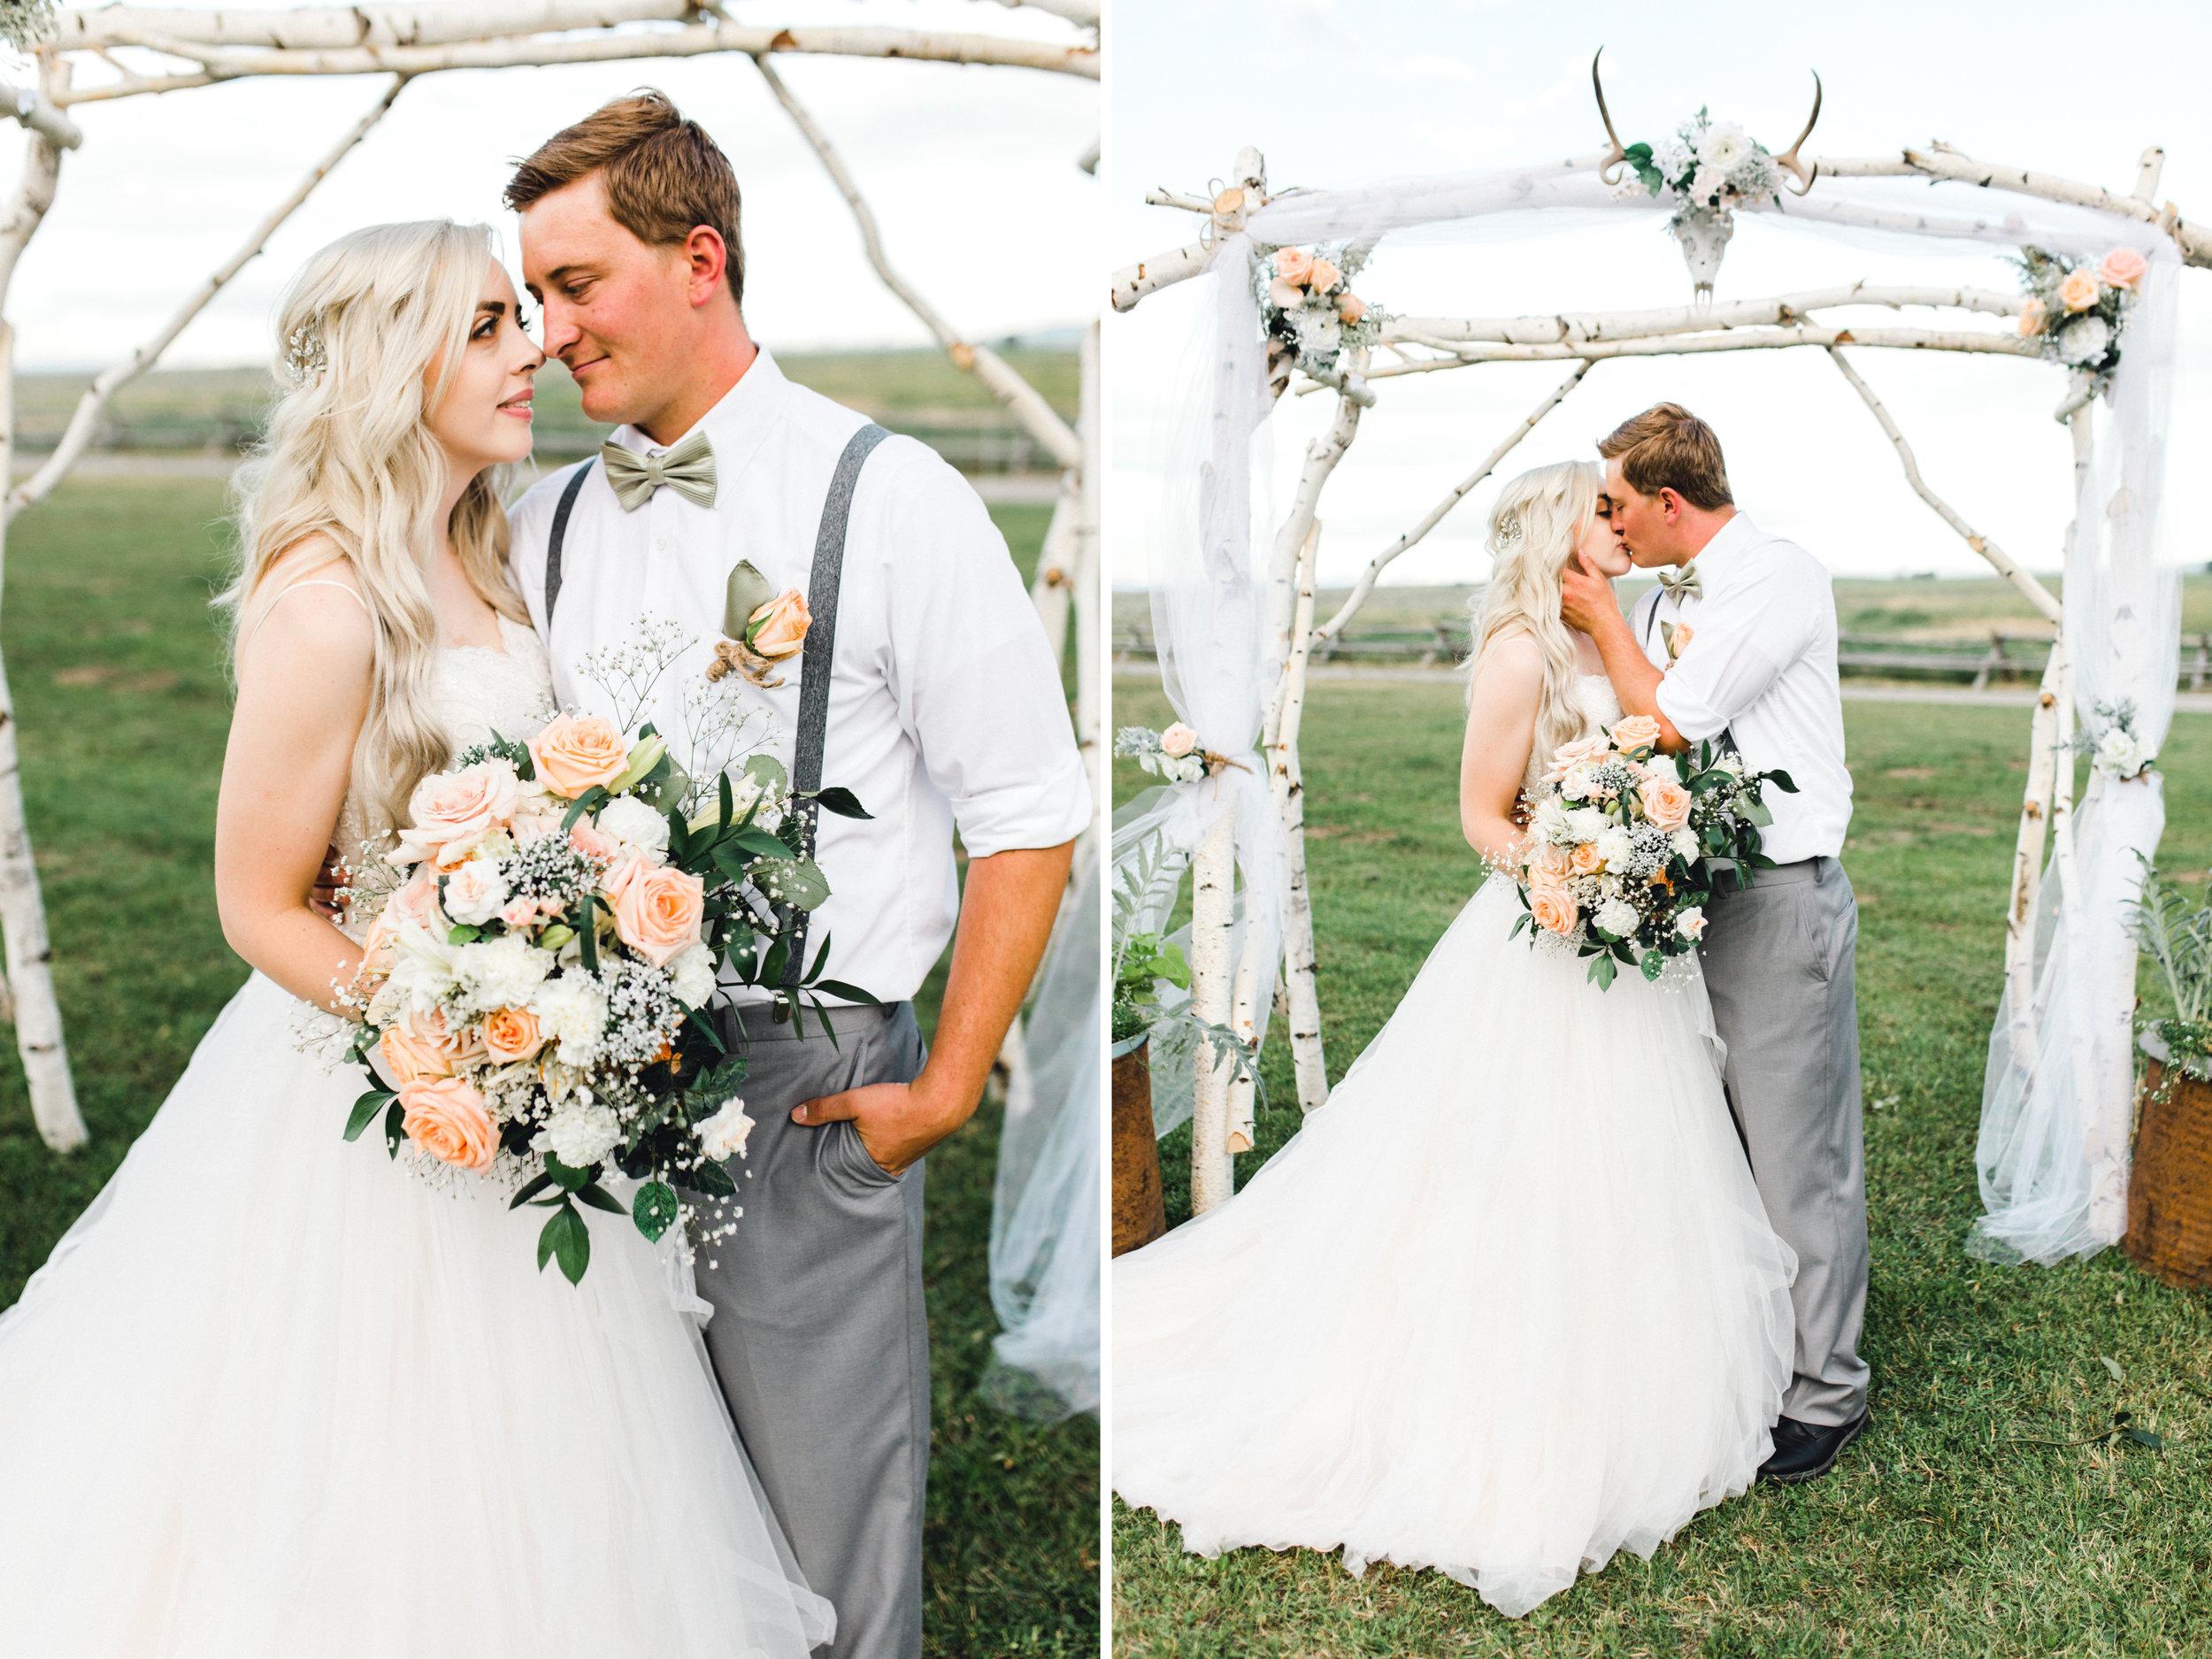 country-outdoor-rustic-wedding-tetons-idaho-anna-christine-photo-25.jpg